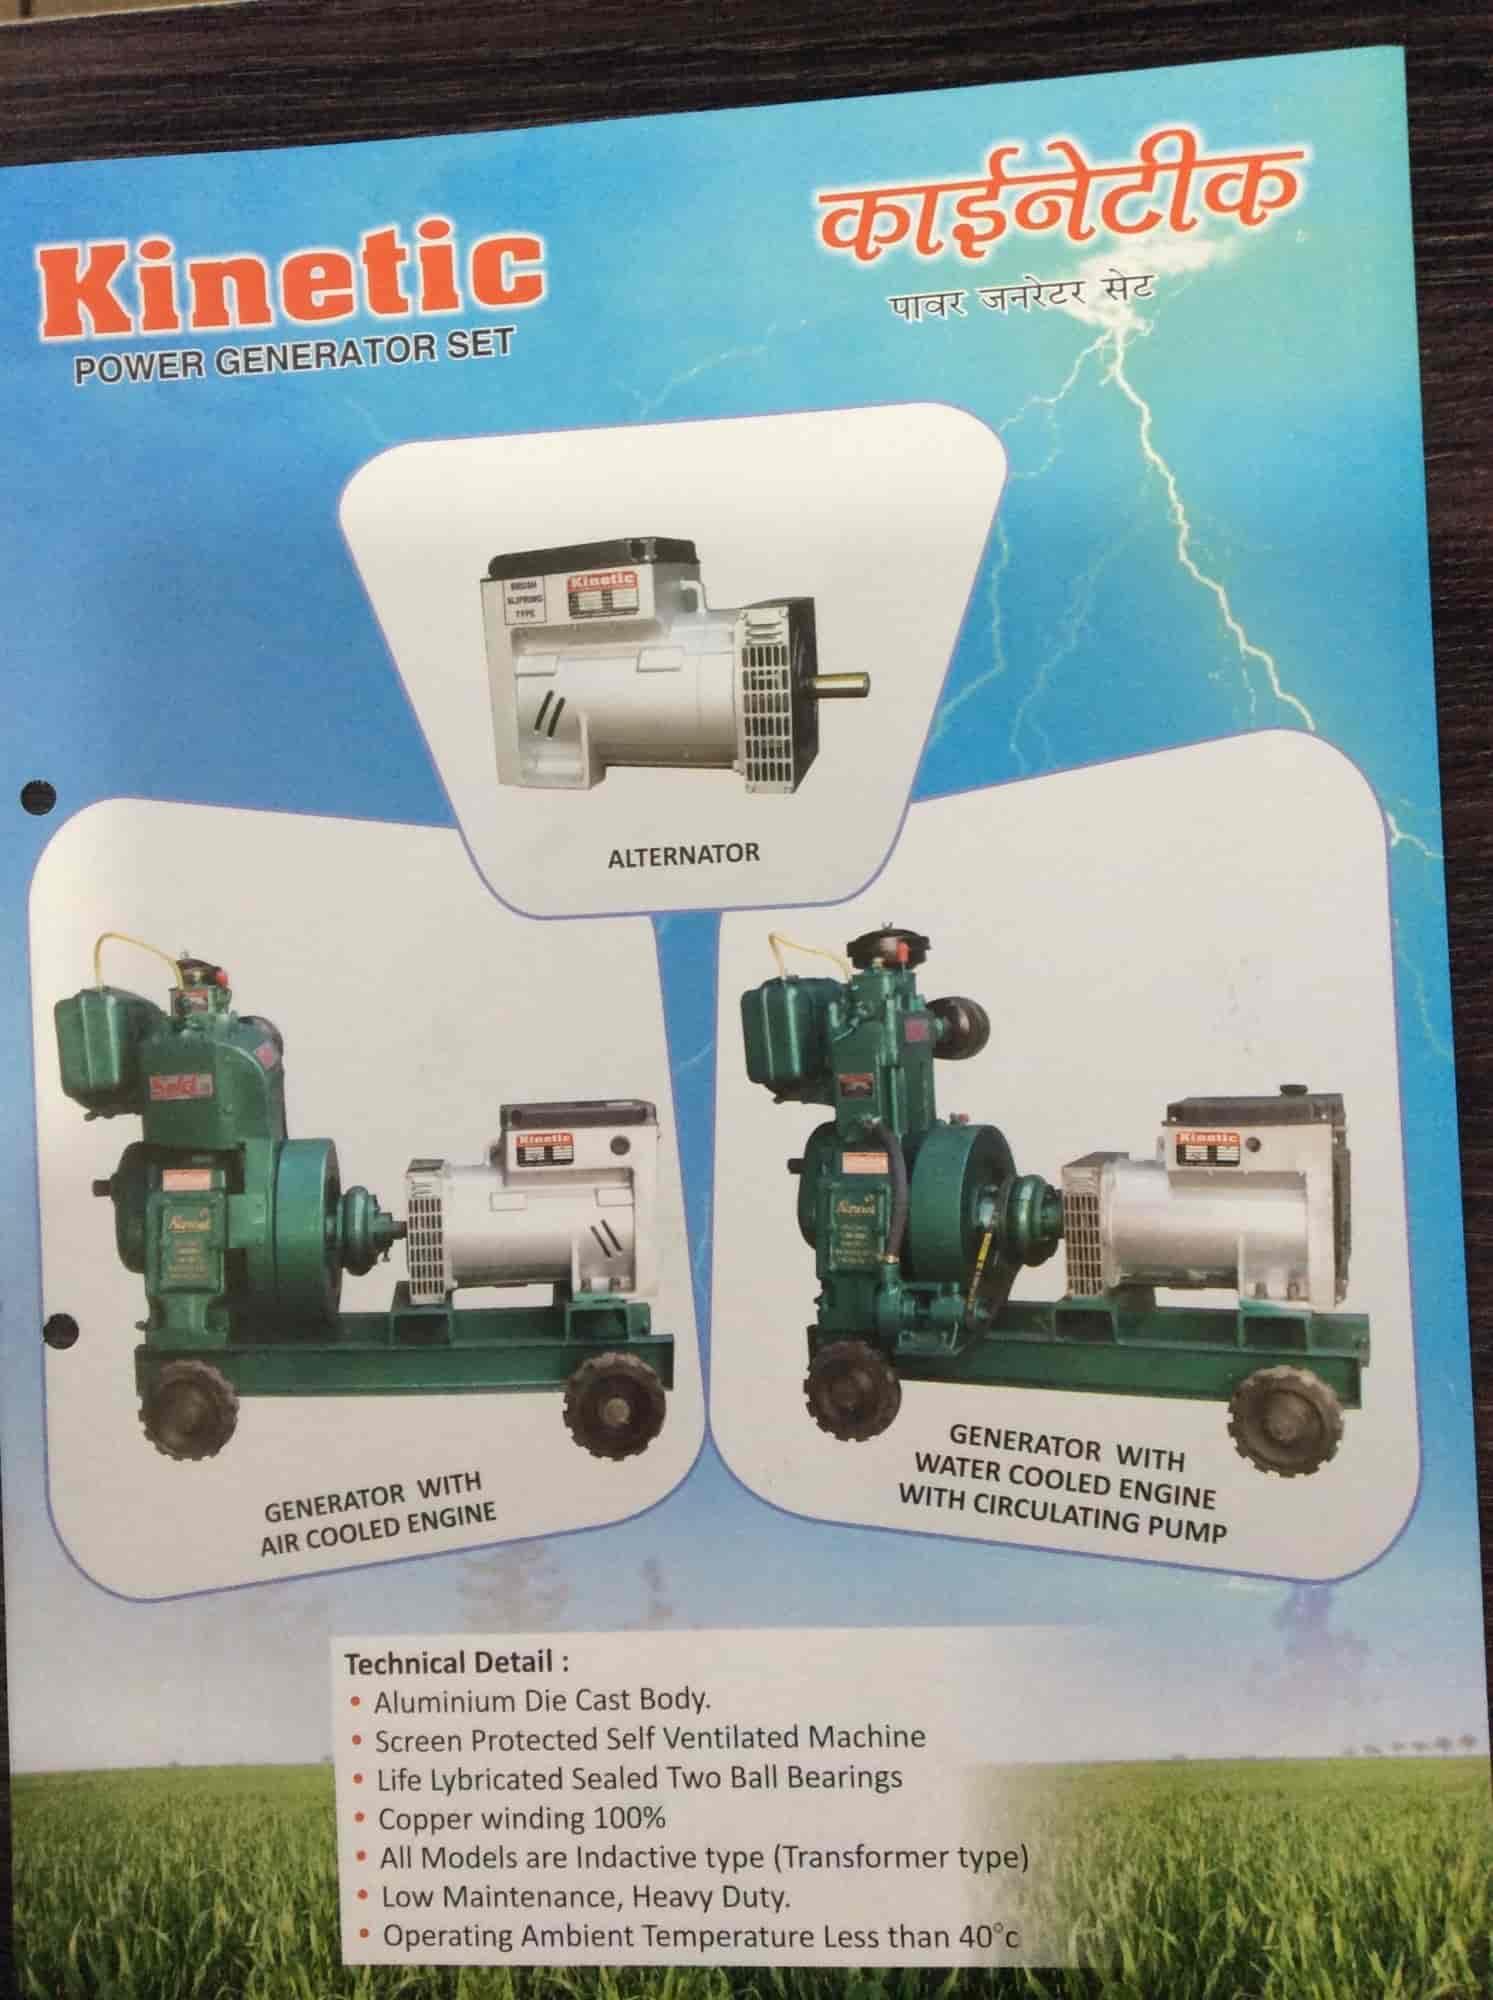 Karnel Industries Mavdi Plot Diesel Engine Manufacturers in